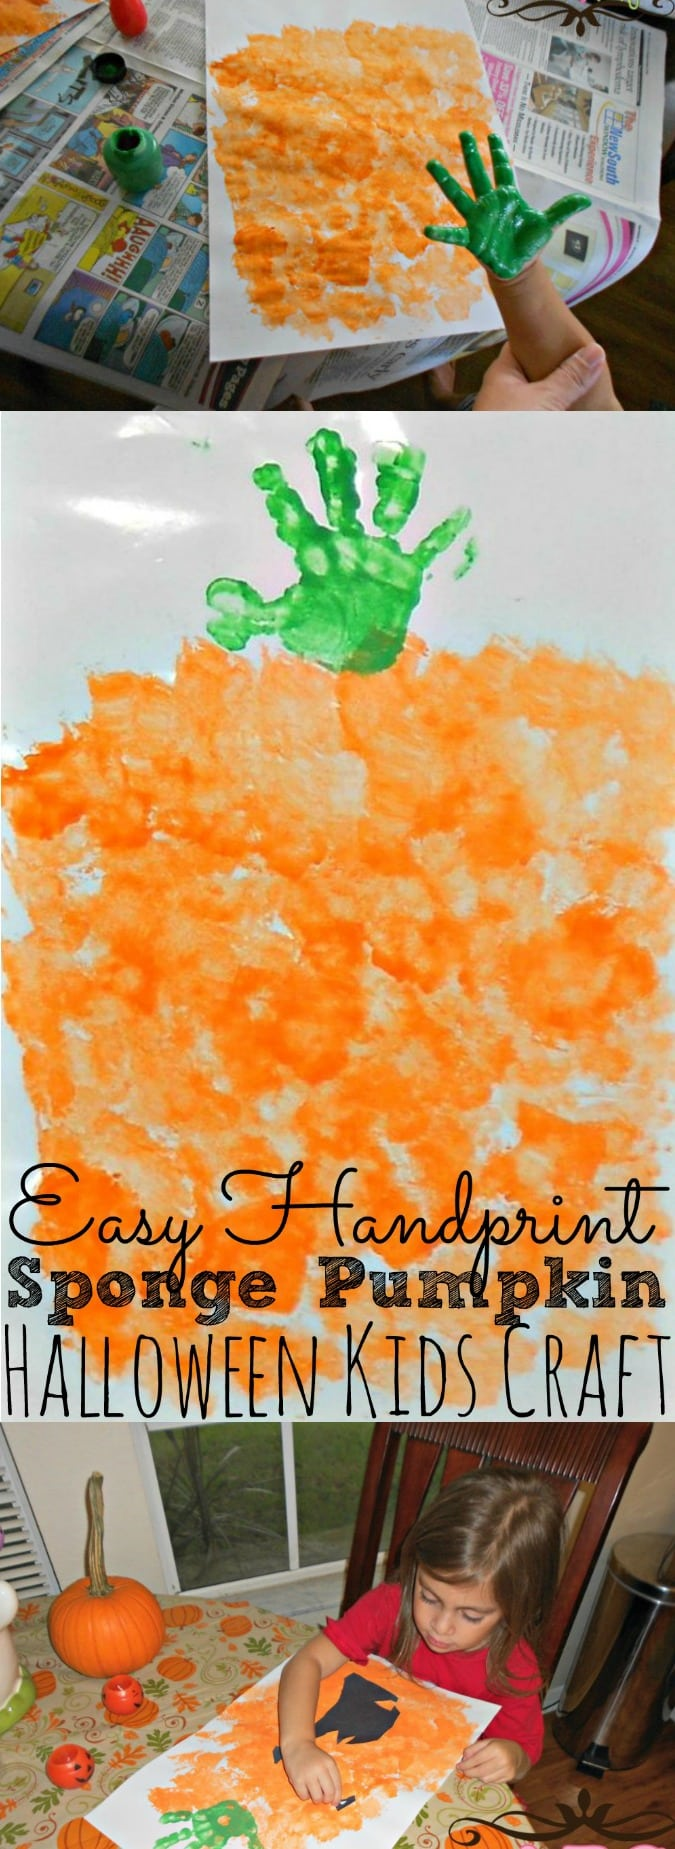 Easy Handprint Sponge Pumpkin Kids Craft - simplytodaylife.com